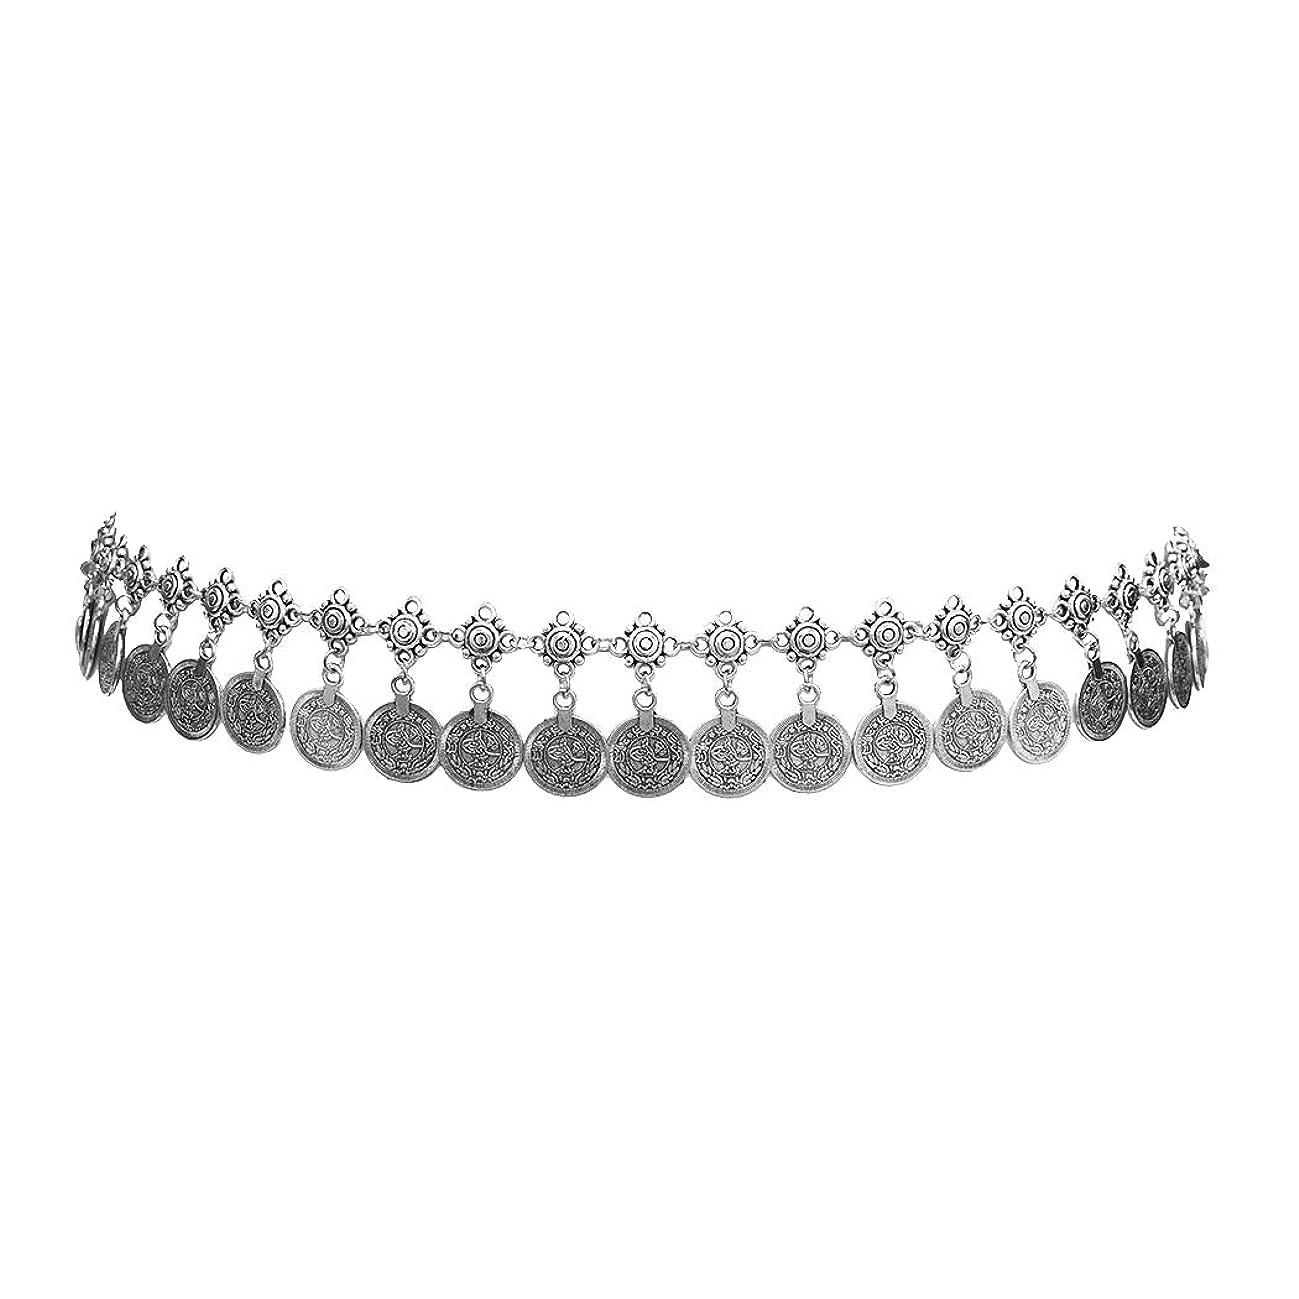 Idealway Gypsy Silver Dangle Coins Belly Chain Hippie Boho Belt Belly Dance Chain Body Jewelry